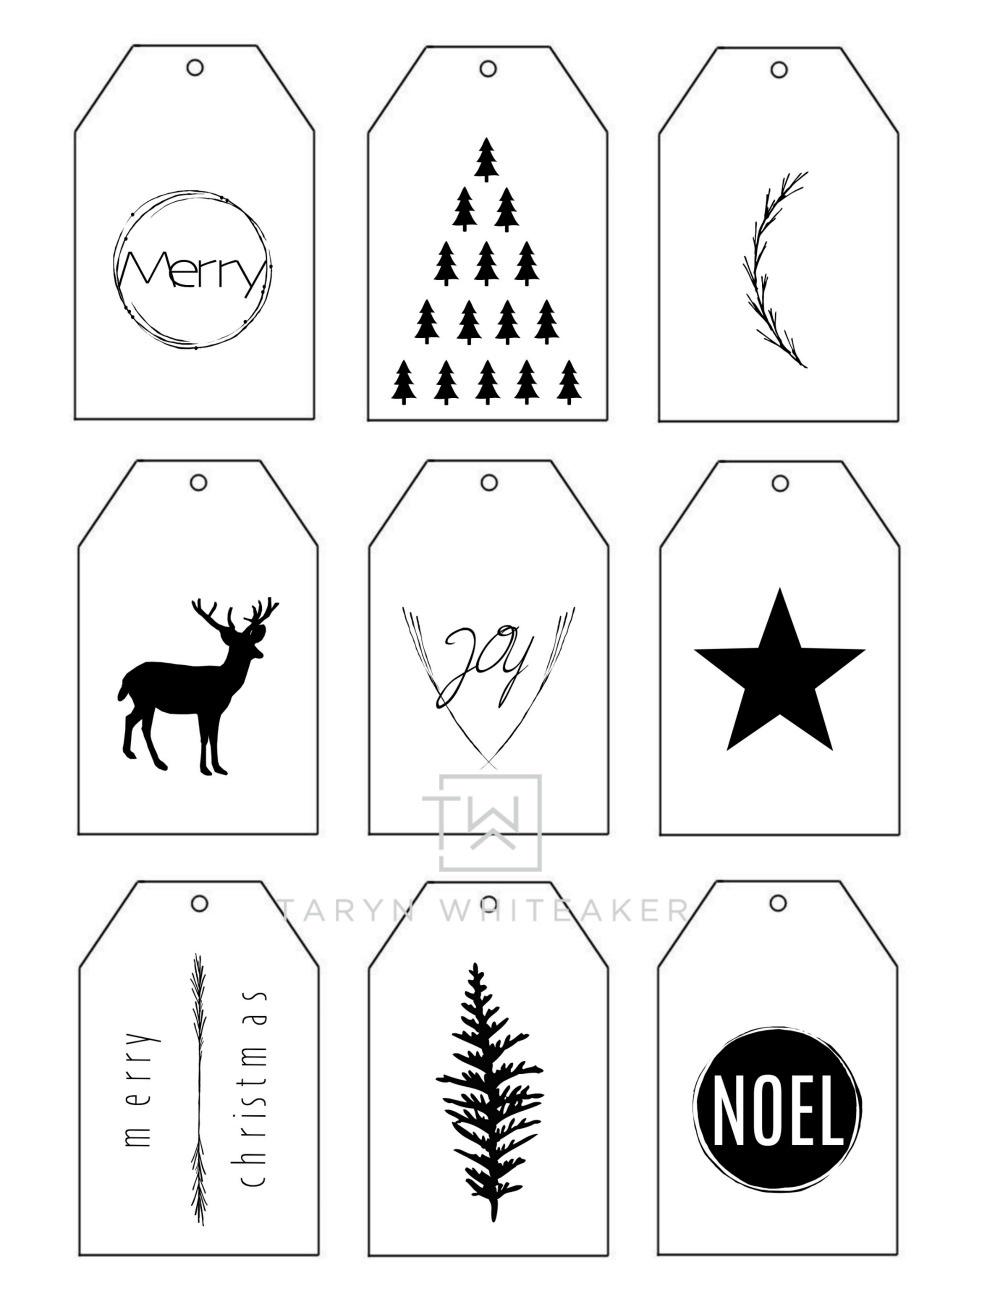 Printable Christmas Gift Tags - Taryn Whiteaker - Christmas Gift Tags Free Printable Black And White